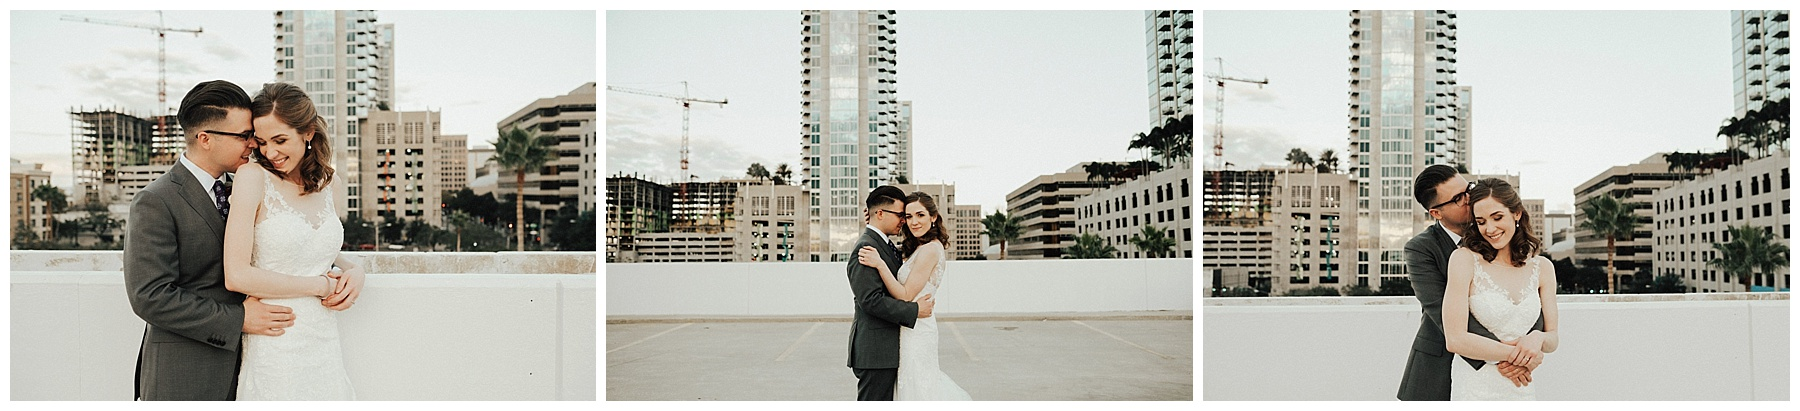 Kylie Garden Wedding Tampa Wedding Photographer-103.jpg